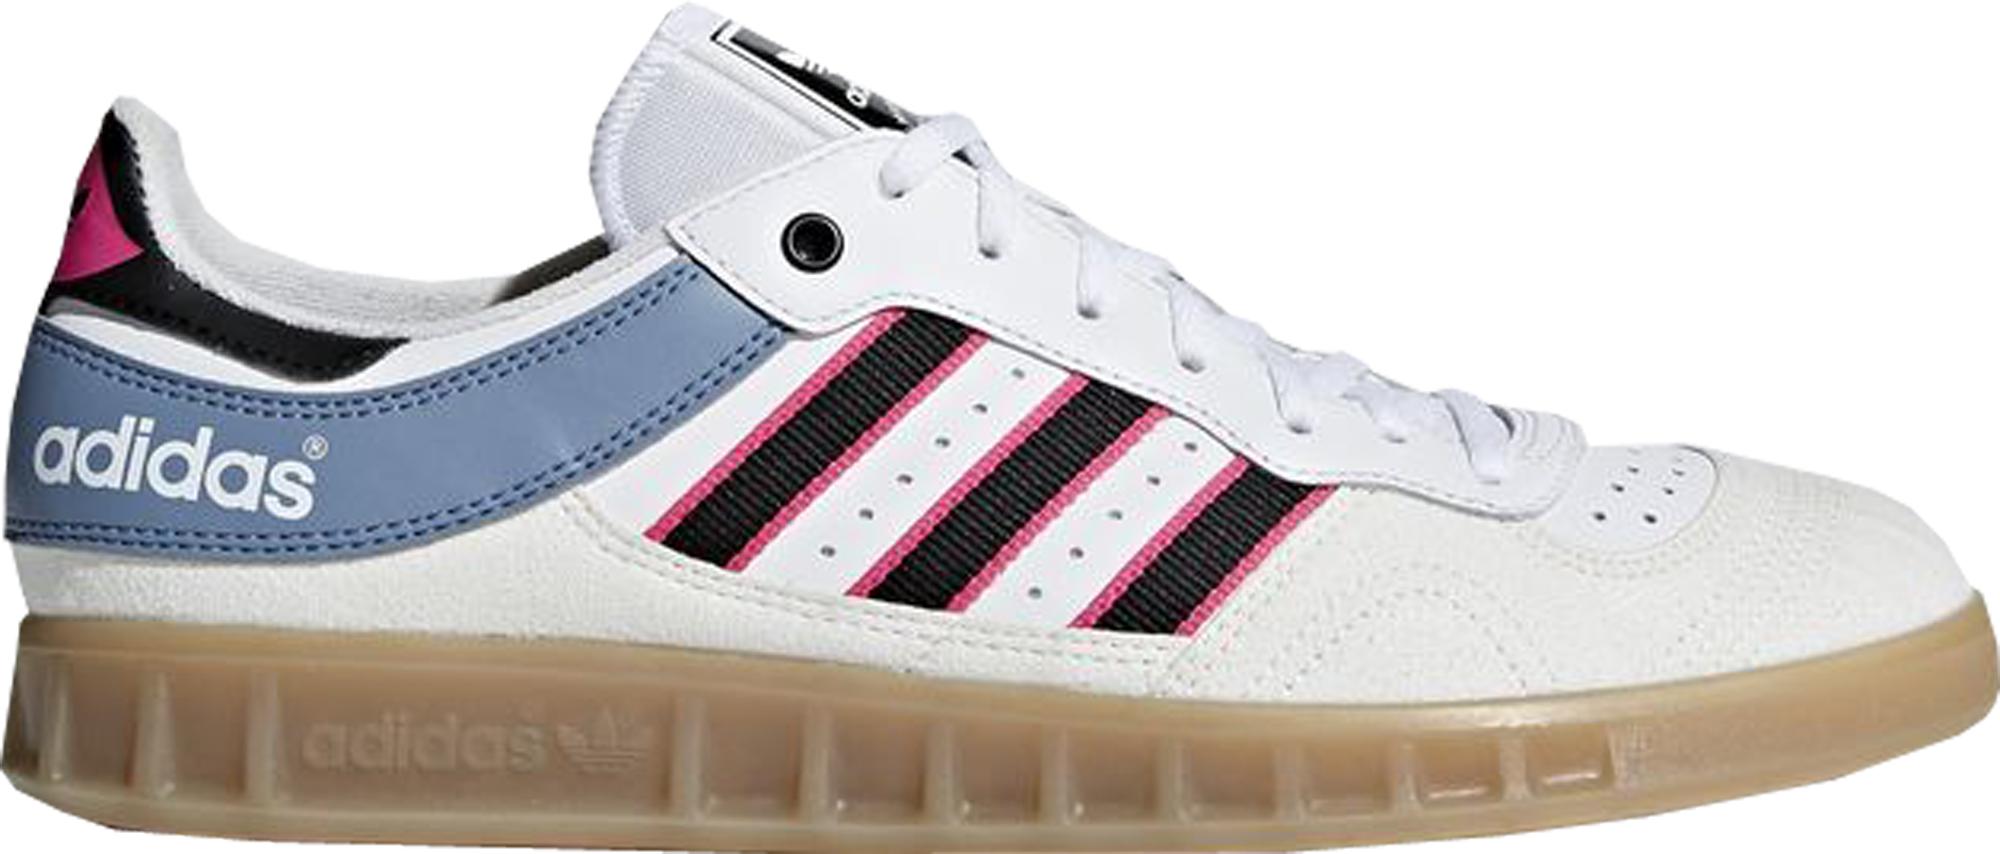 adidas Handball Top White Black Pink